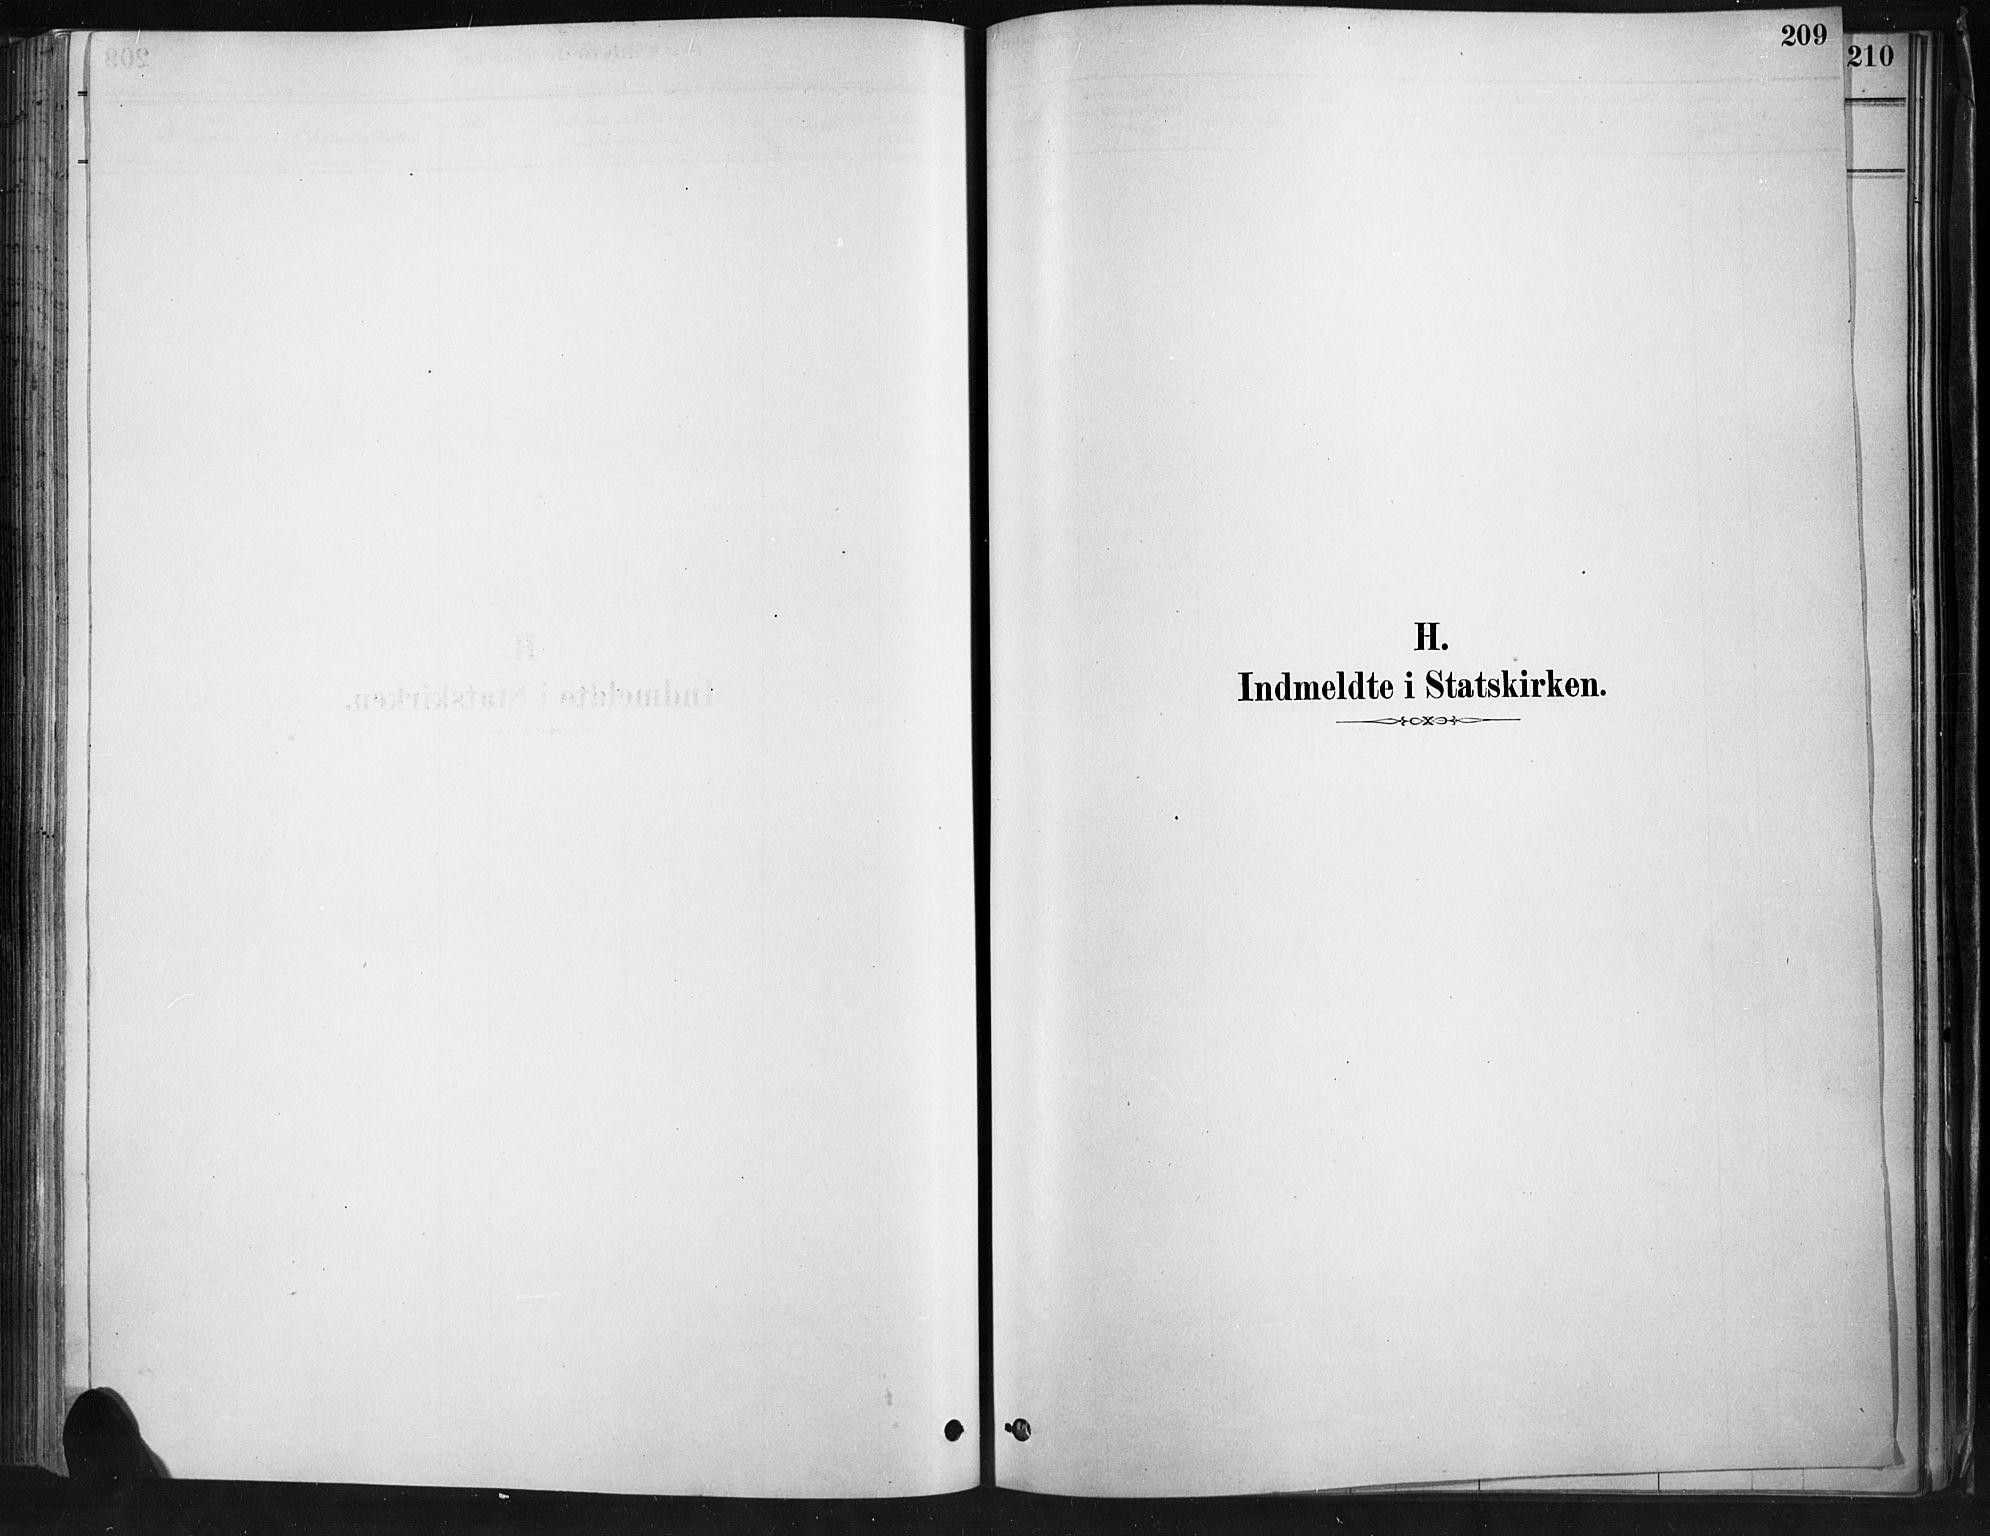 SAH, Ringebu prestekontor, Ministerialbok nr. 9, 1878-1898, s. 209